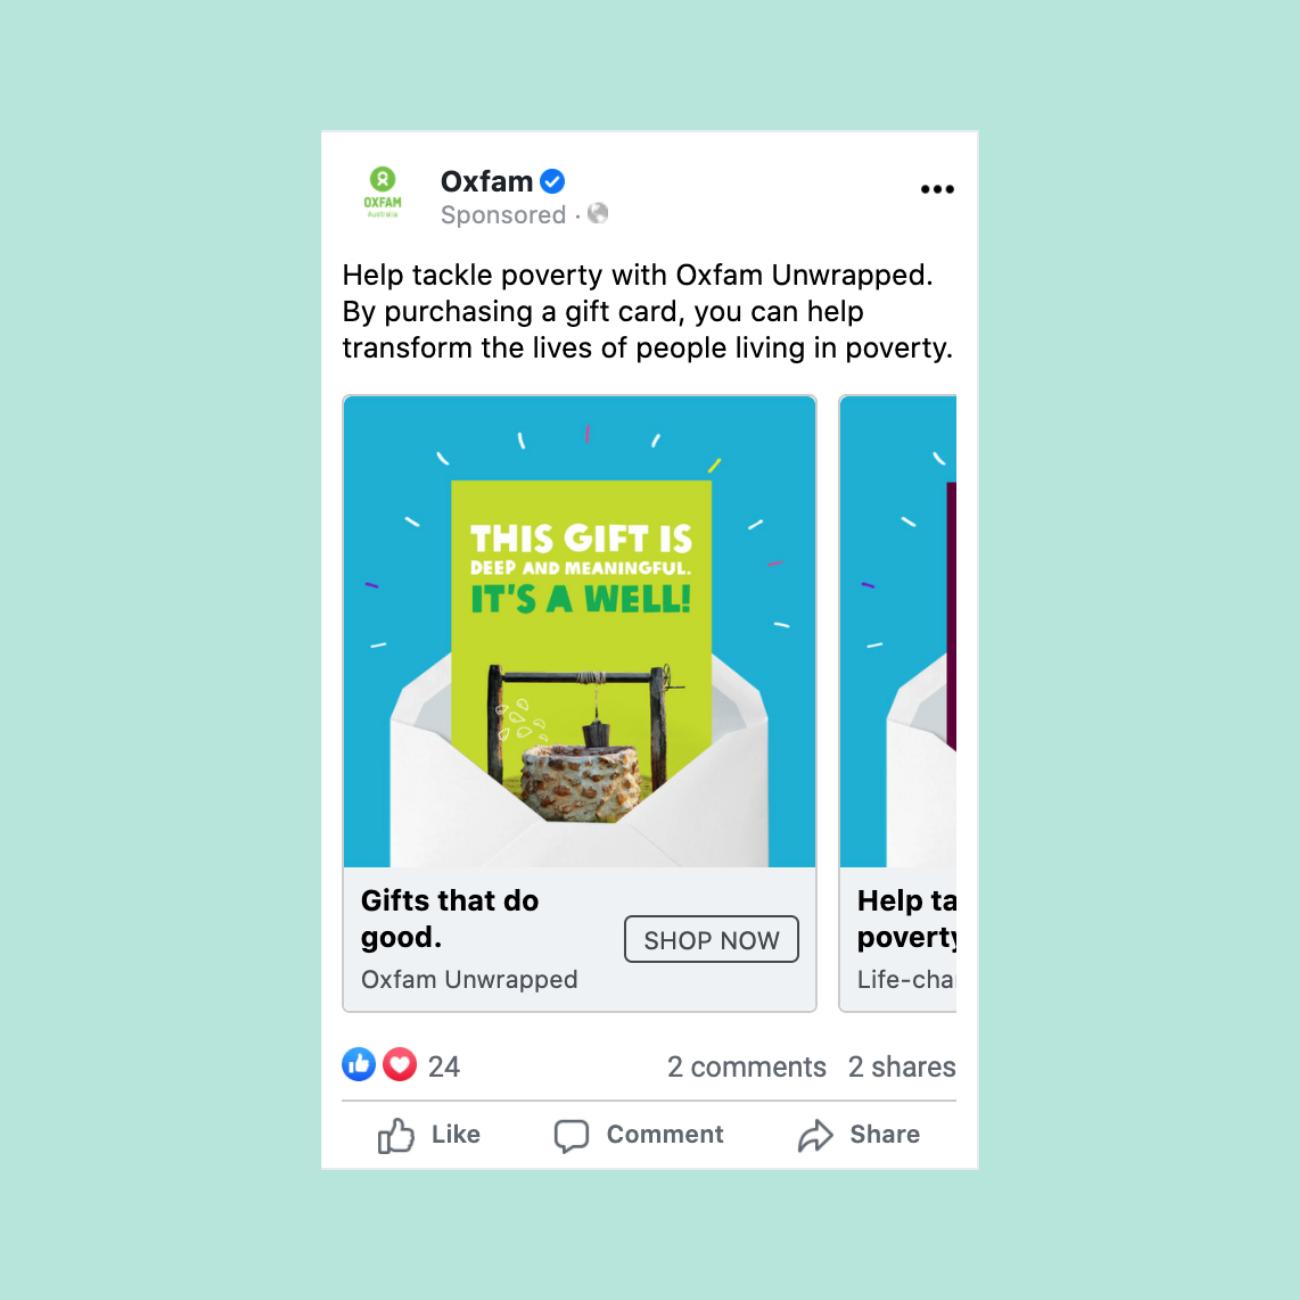 Oxfam Unwrapped digital advertising